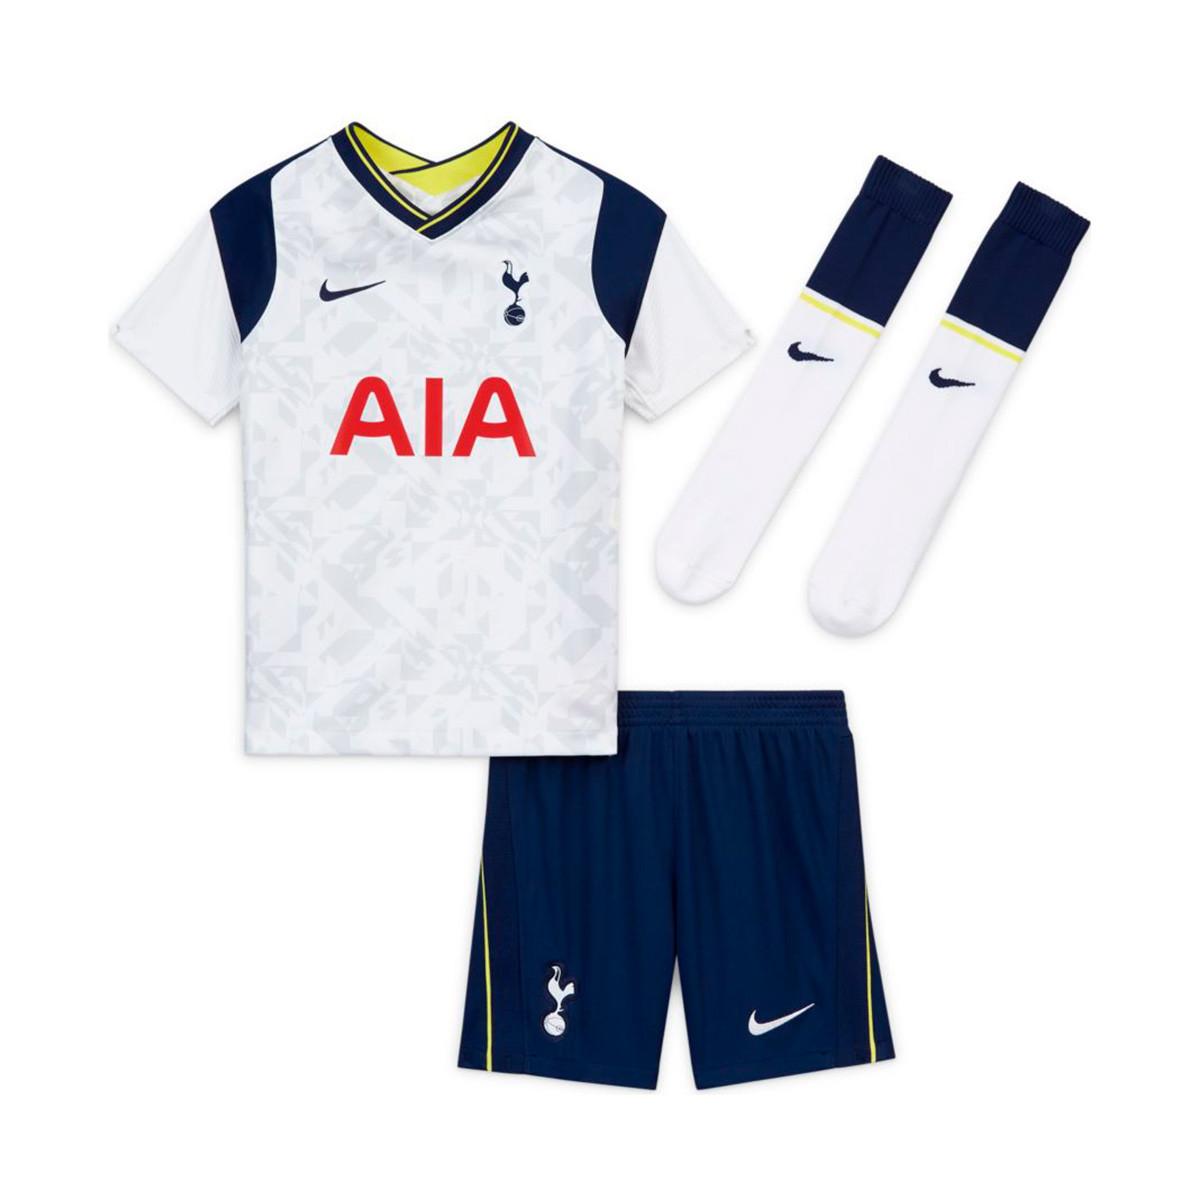 Kit Nike Kids Tottenham Hotspur Fc Home Kit 2020 2021 White Binary Blue Futbol Emotion